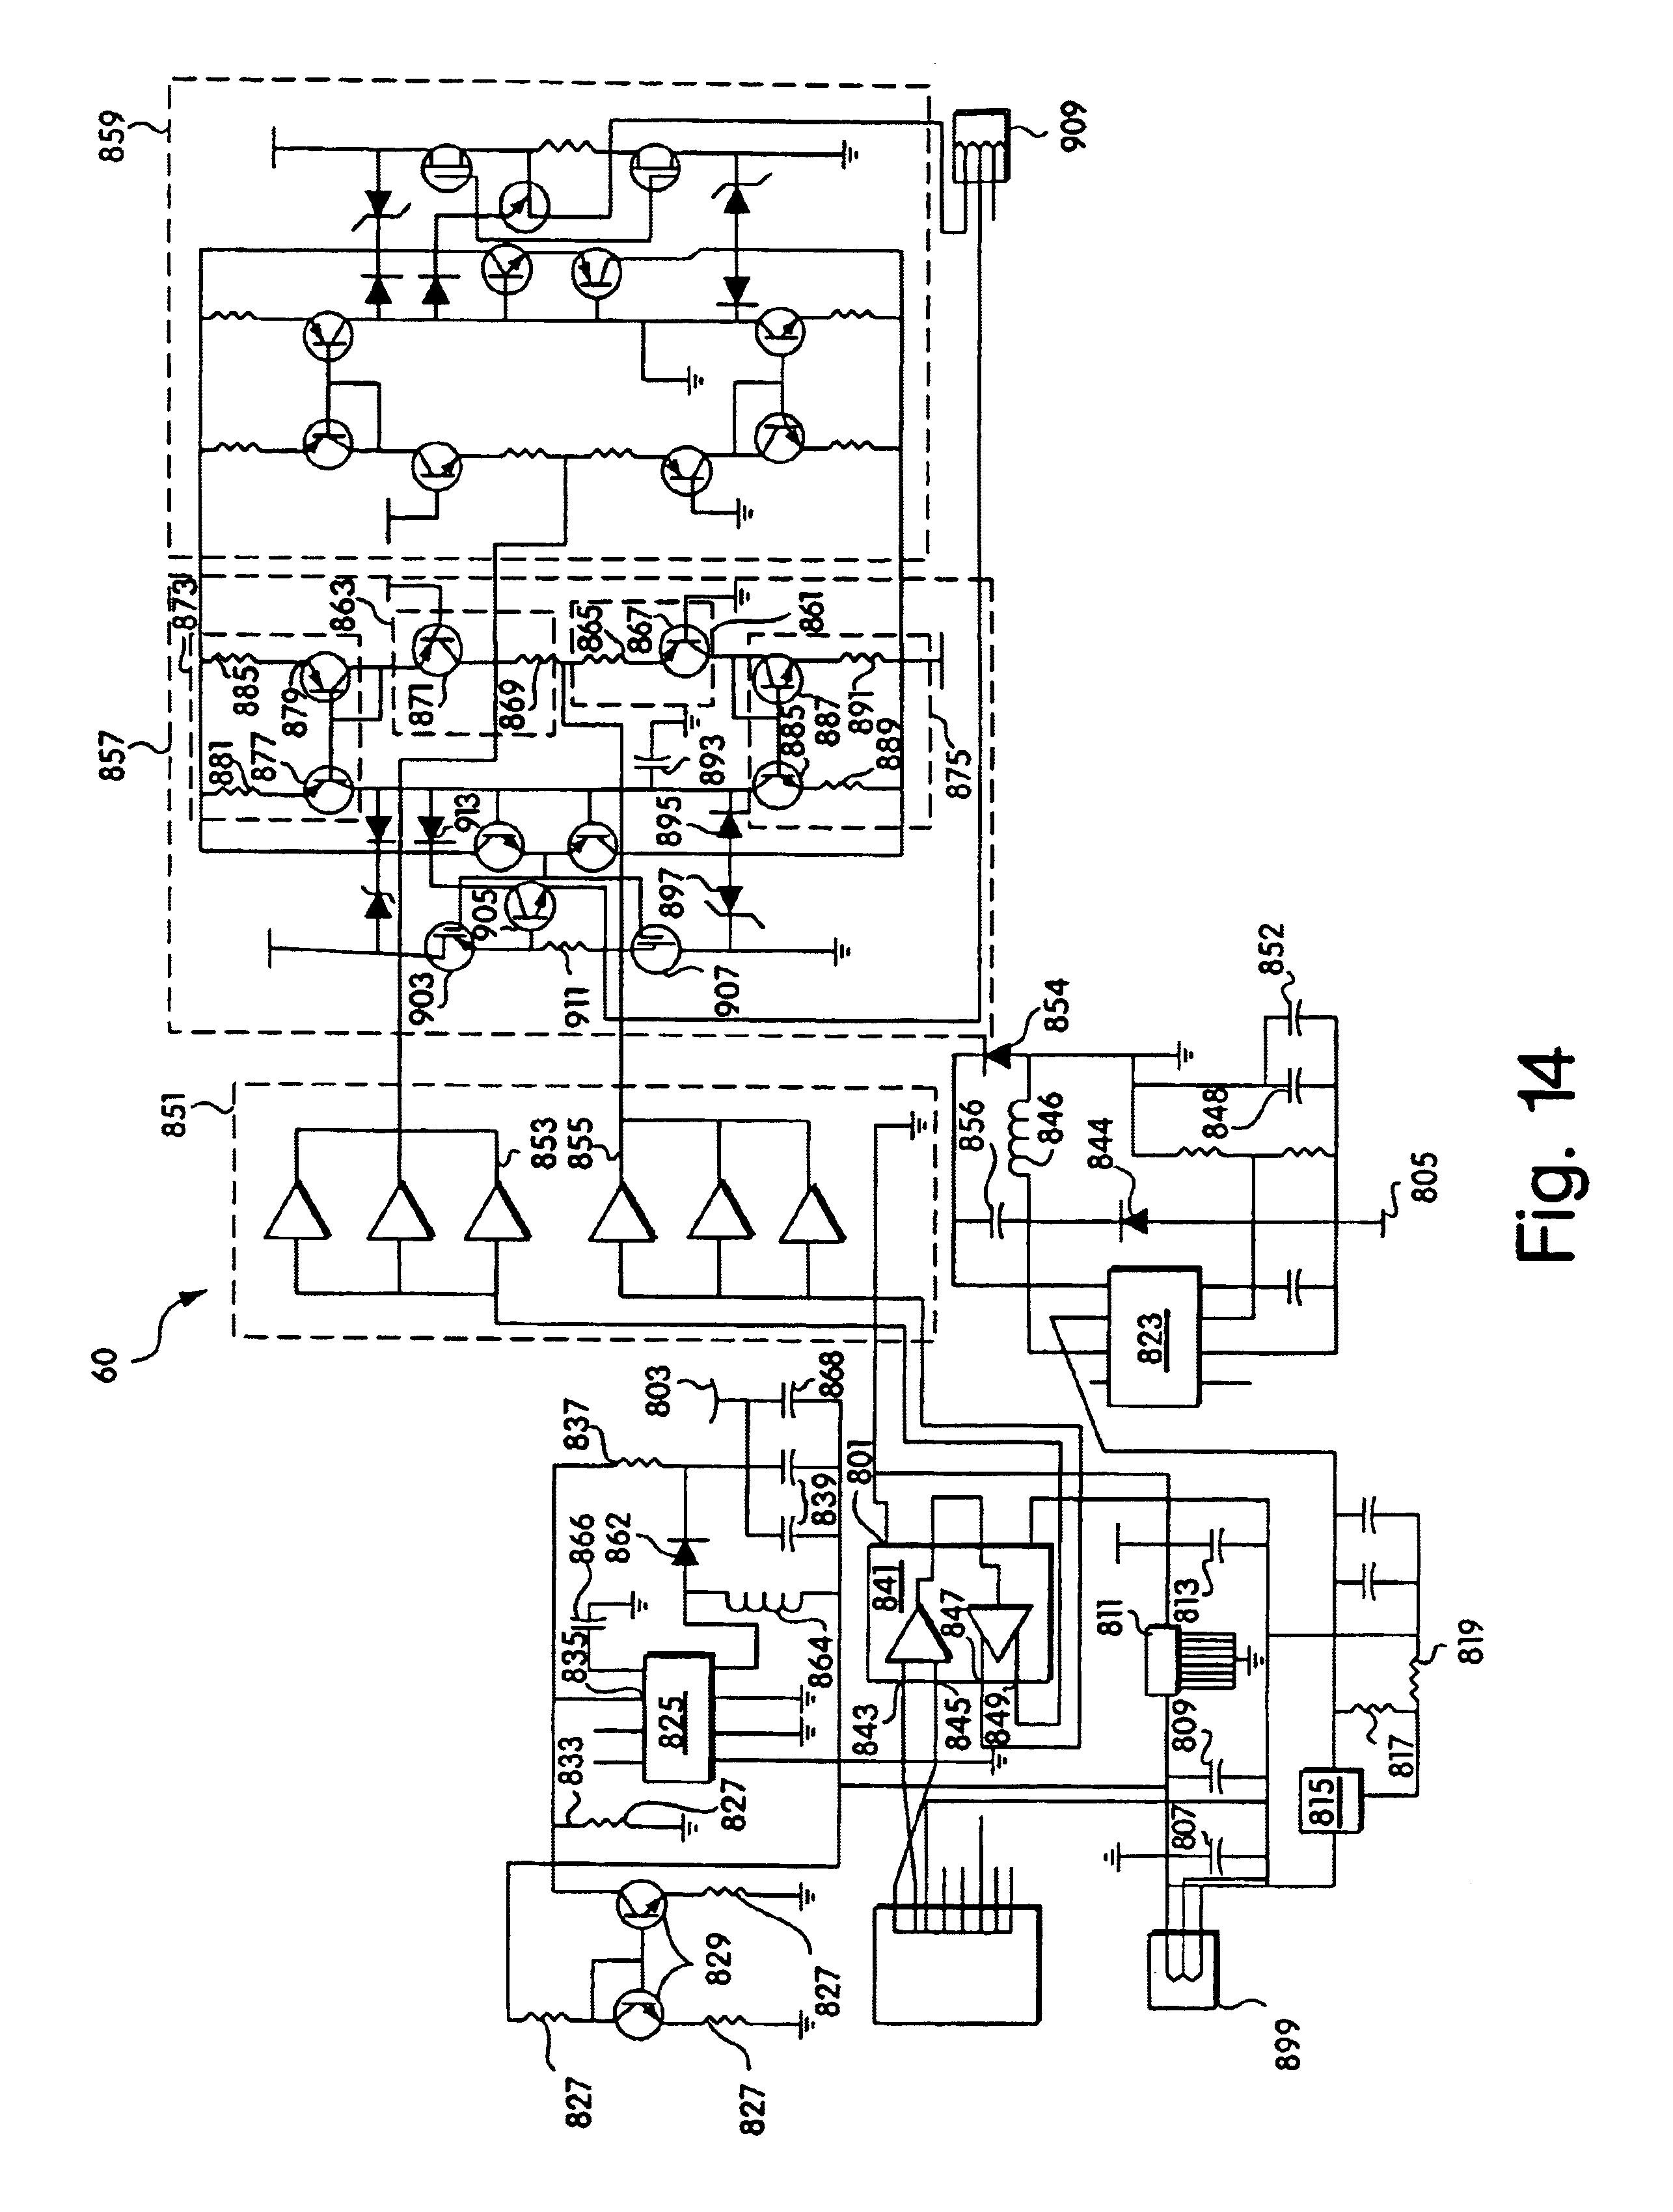 [DIAGRAM] Volvo Vnl Wiring Diagram FULL Version HD Quality